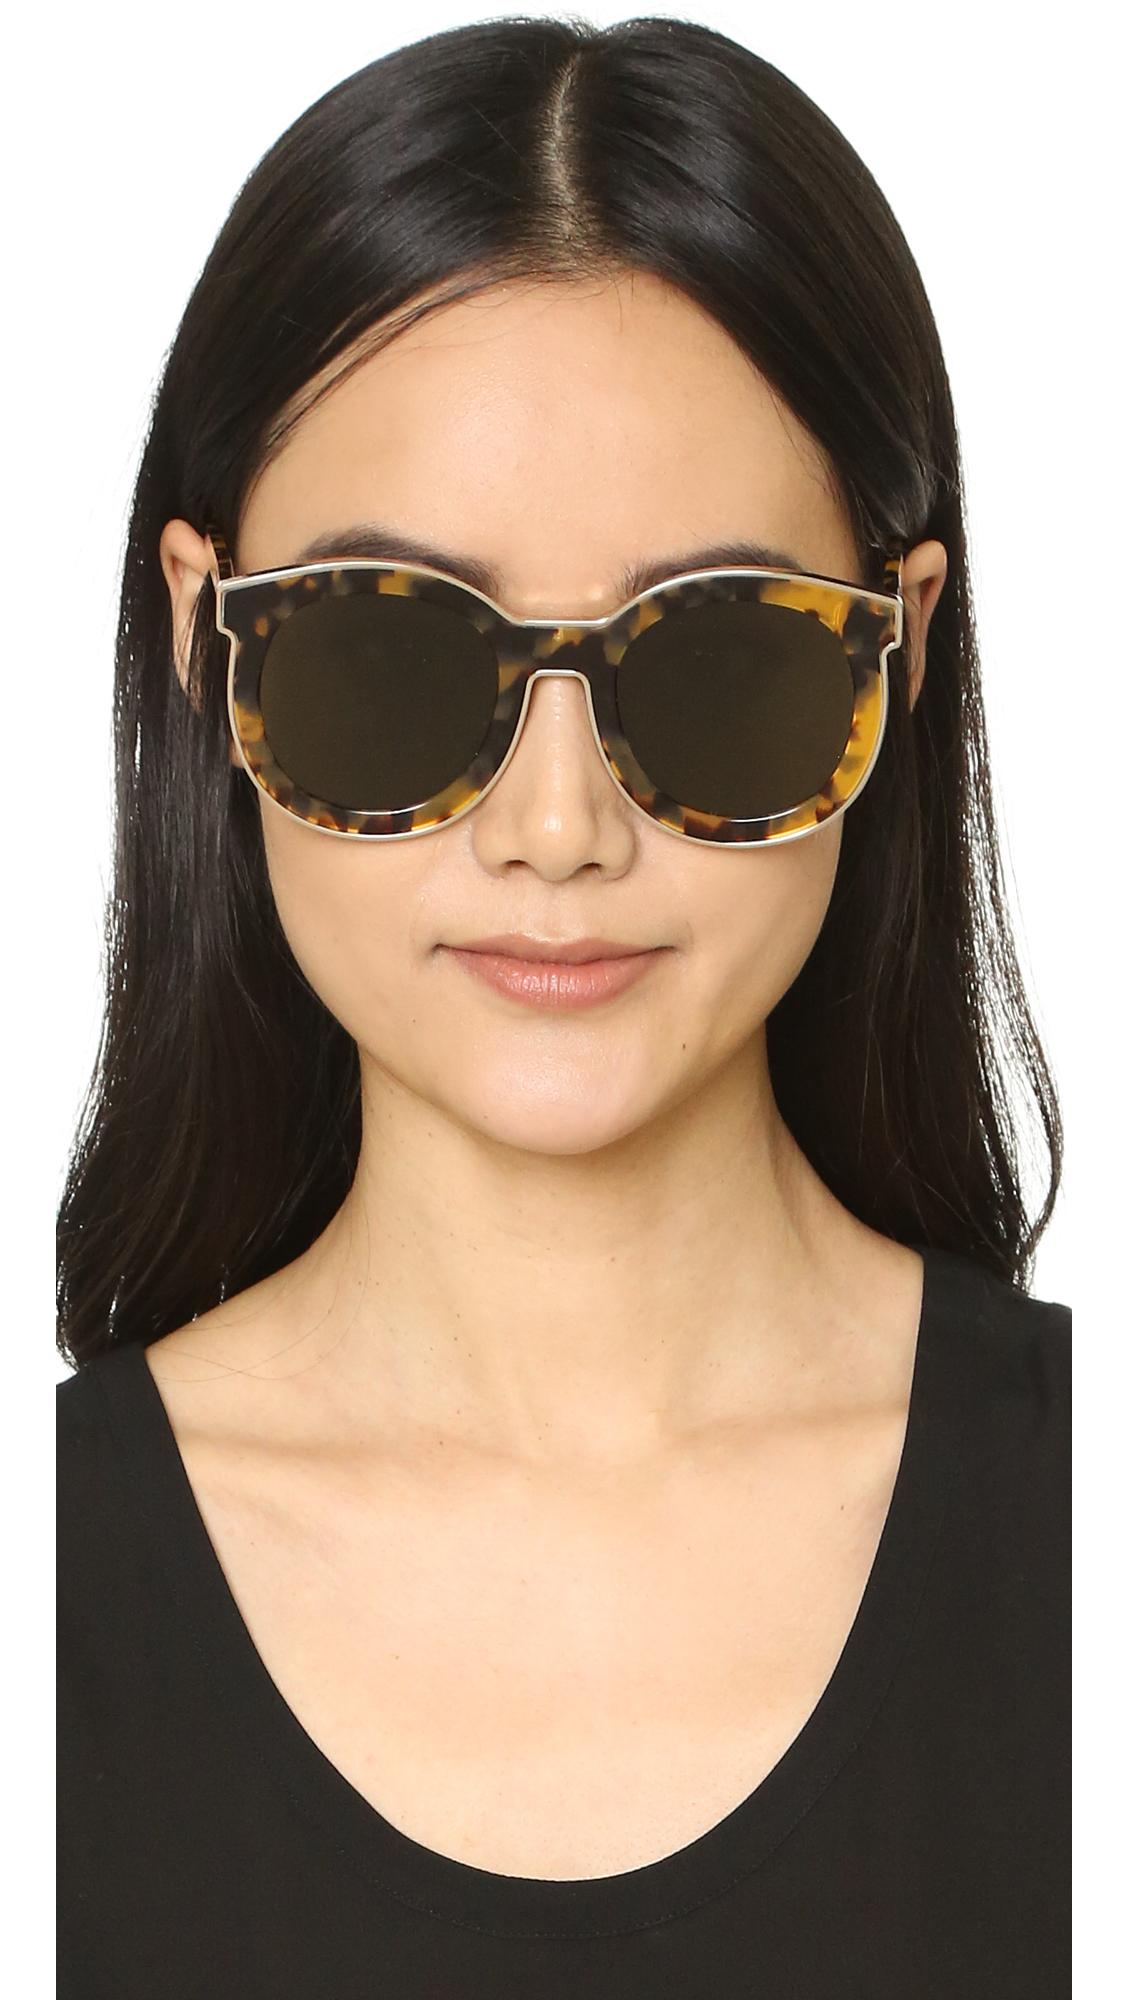 6998159b0c10 Karen Walker Super Spaceship Flat Lens Sunglasses